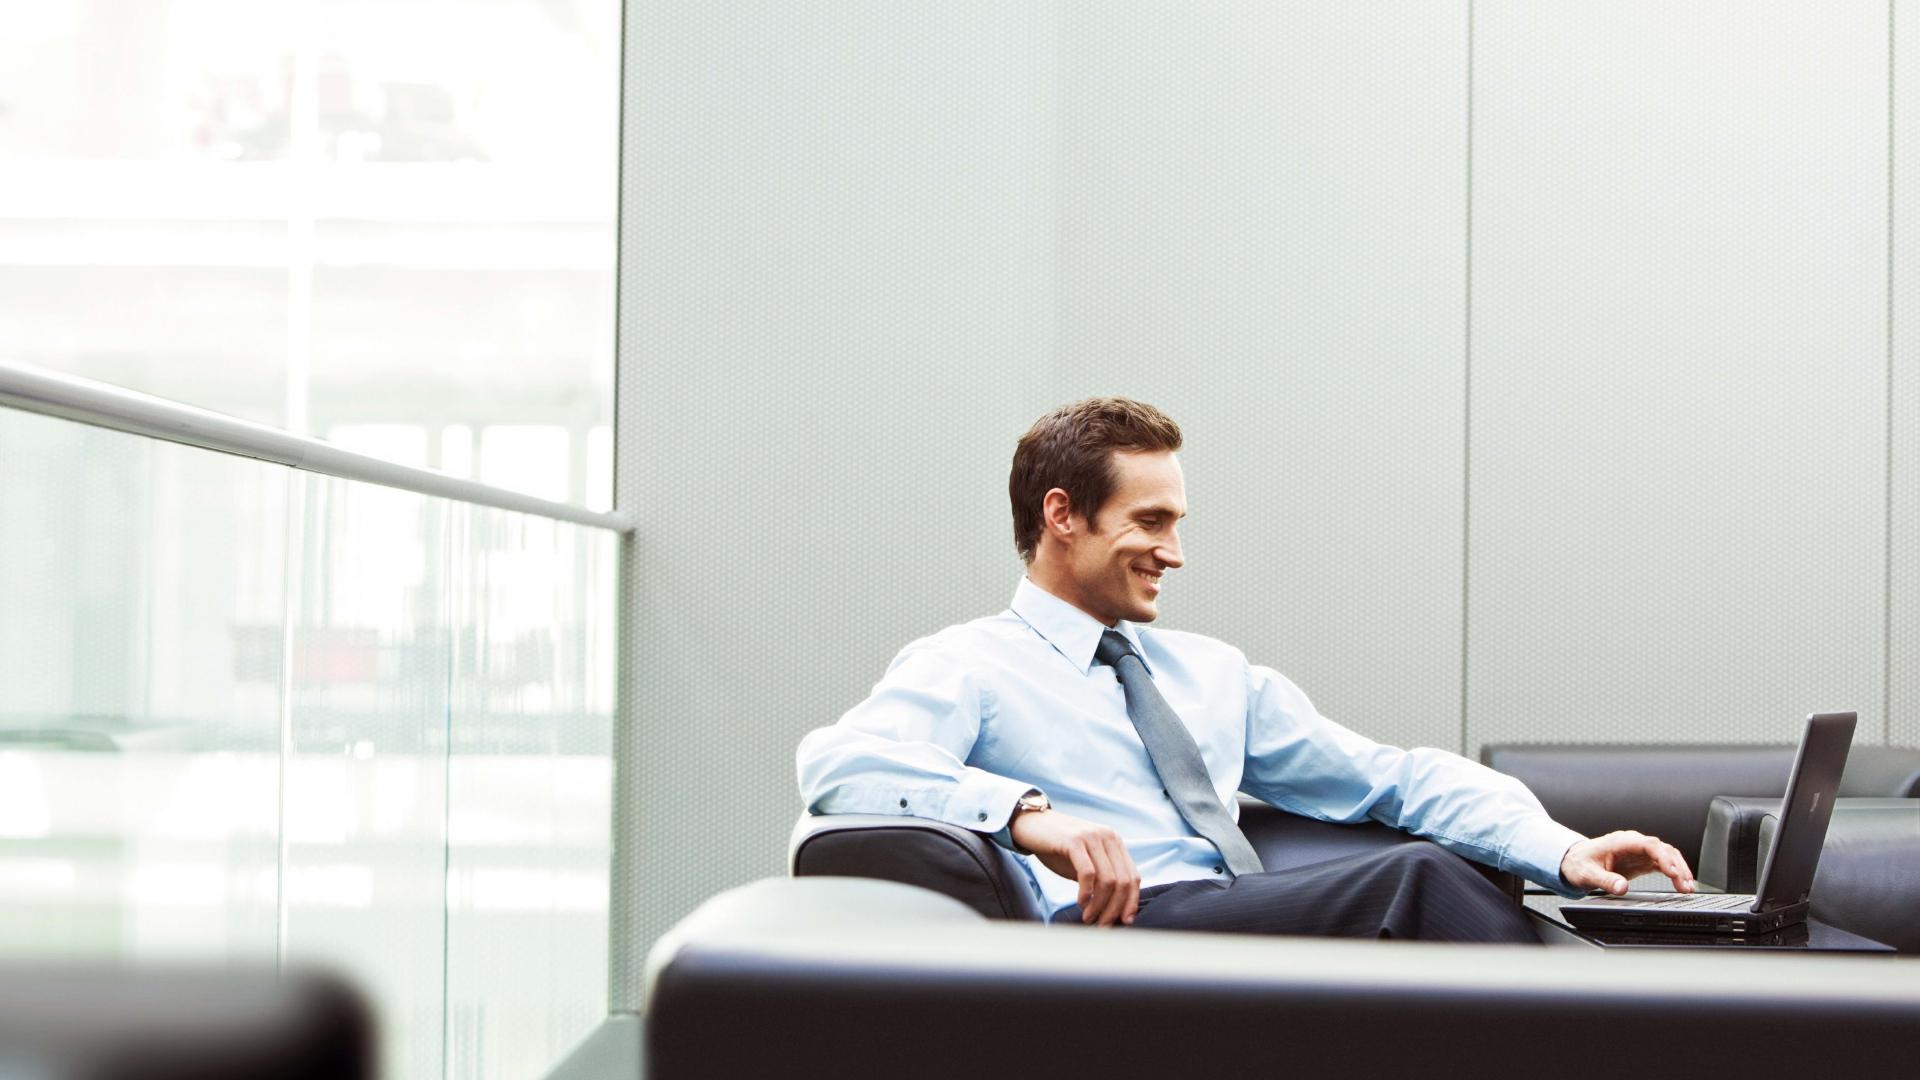 Download Wallpaper 1920x1080 Man Office Businessman Smile Laptop